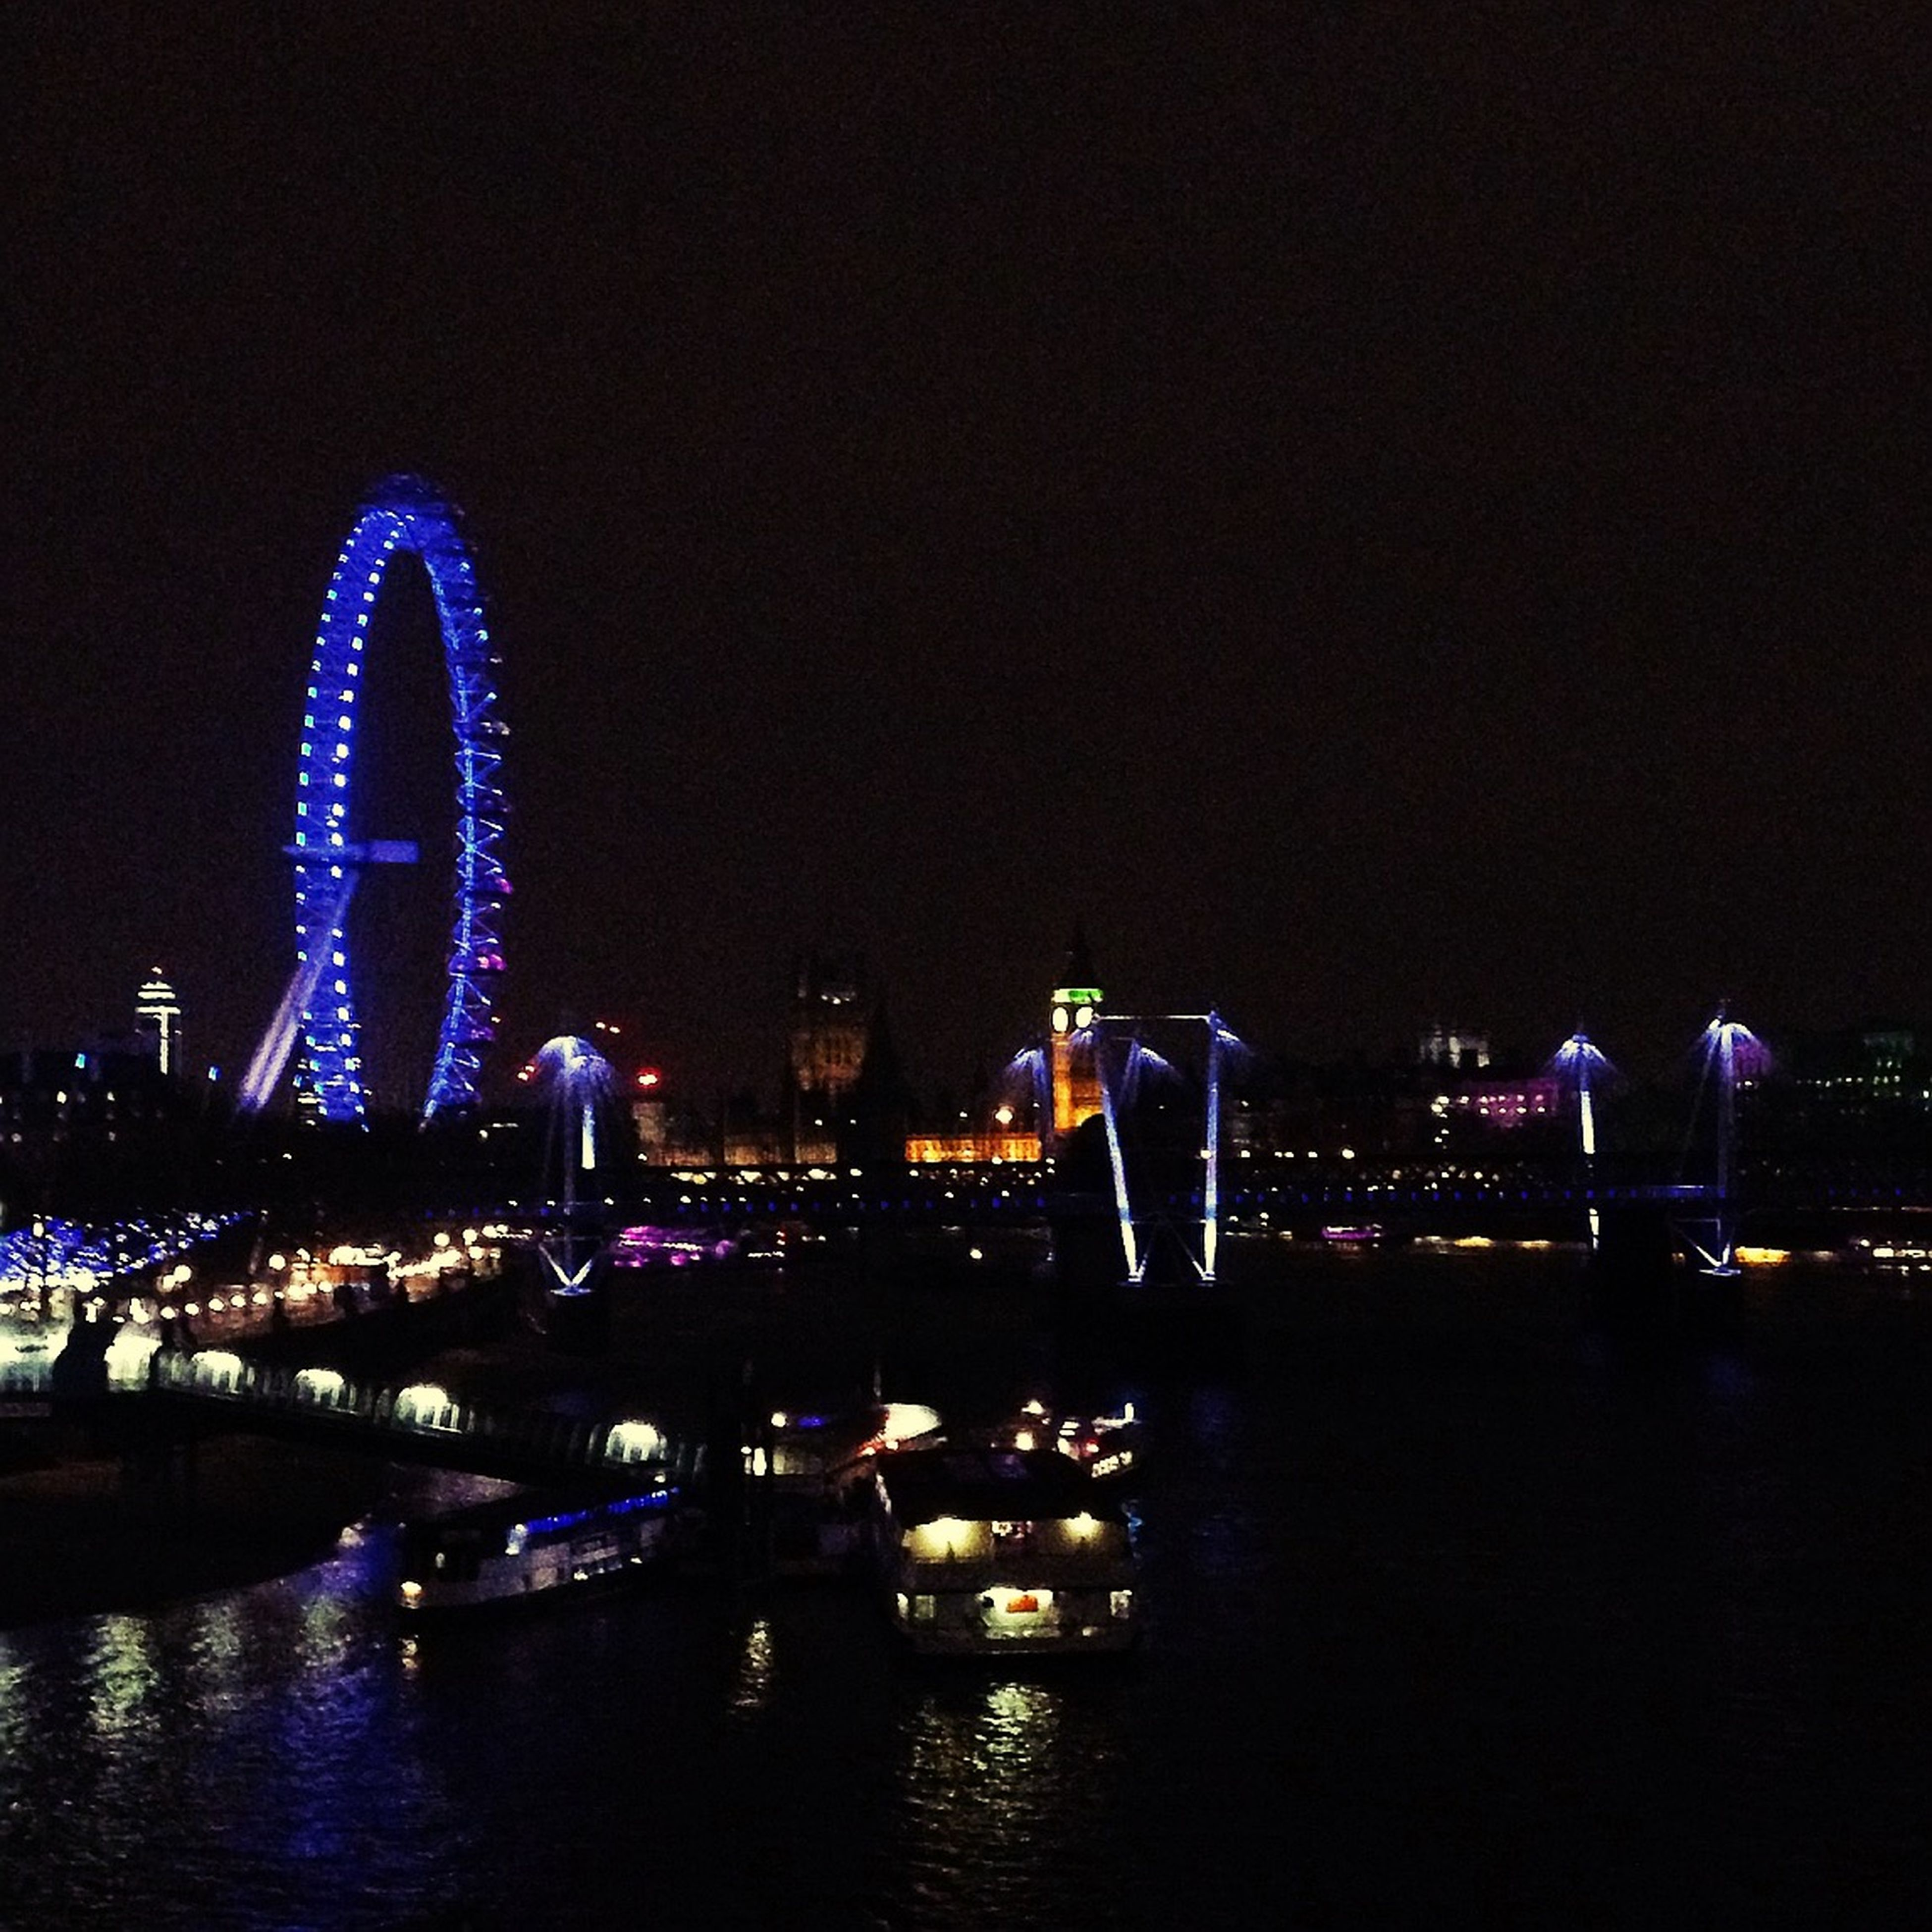 River Thames Nightphotography Night Lights LondonEye Ferris Wheel